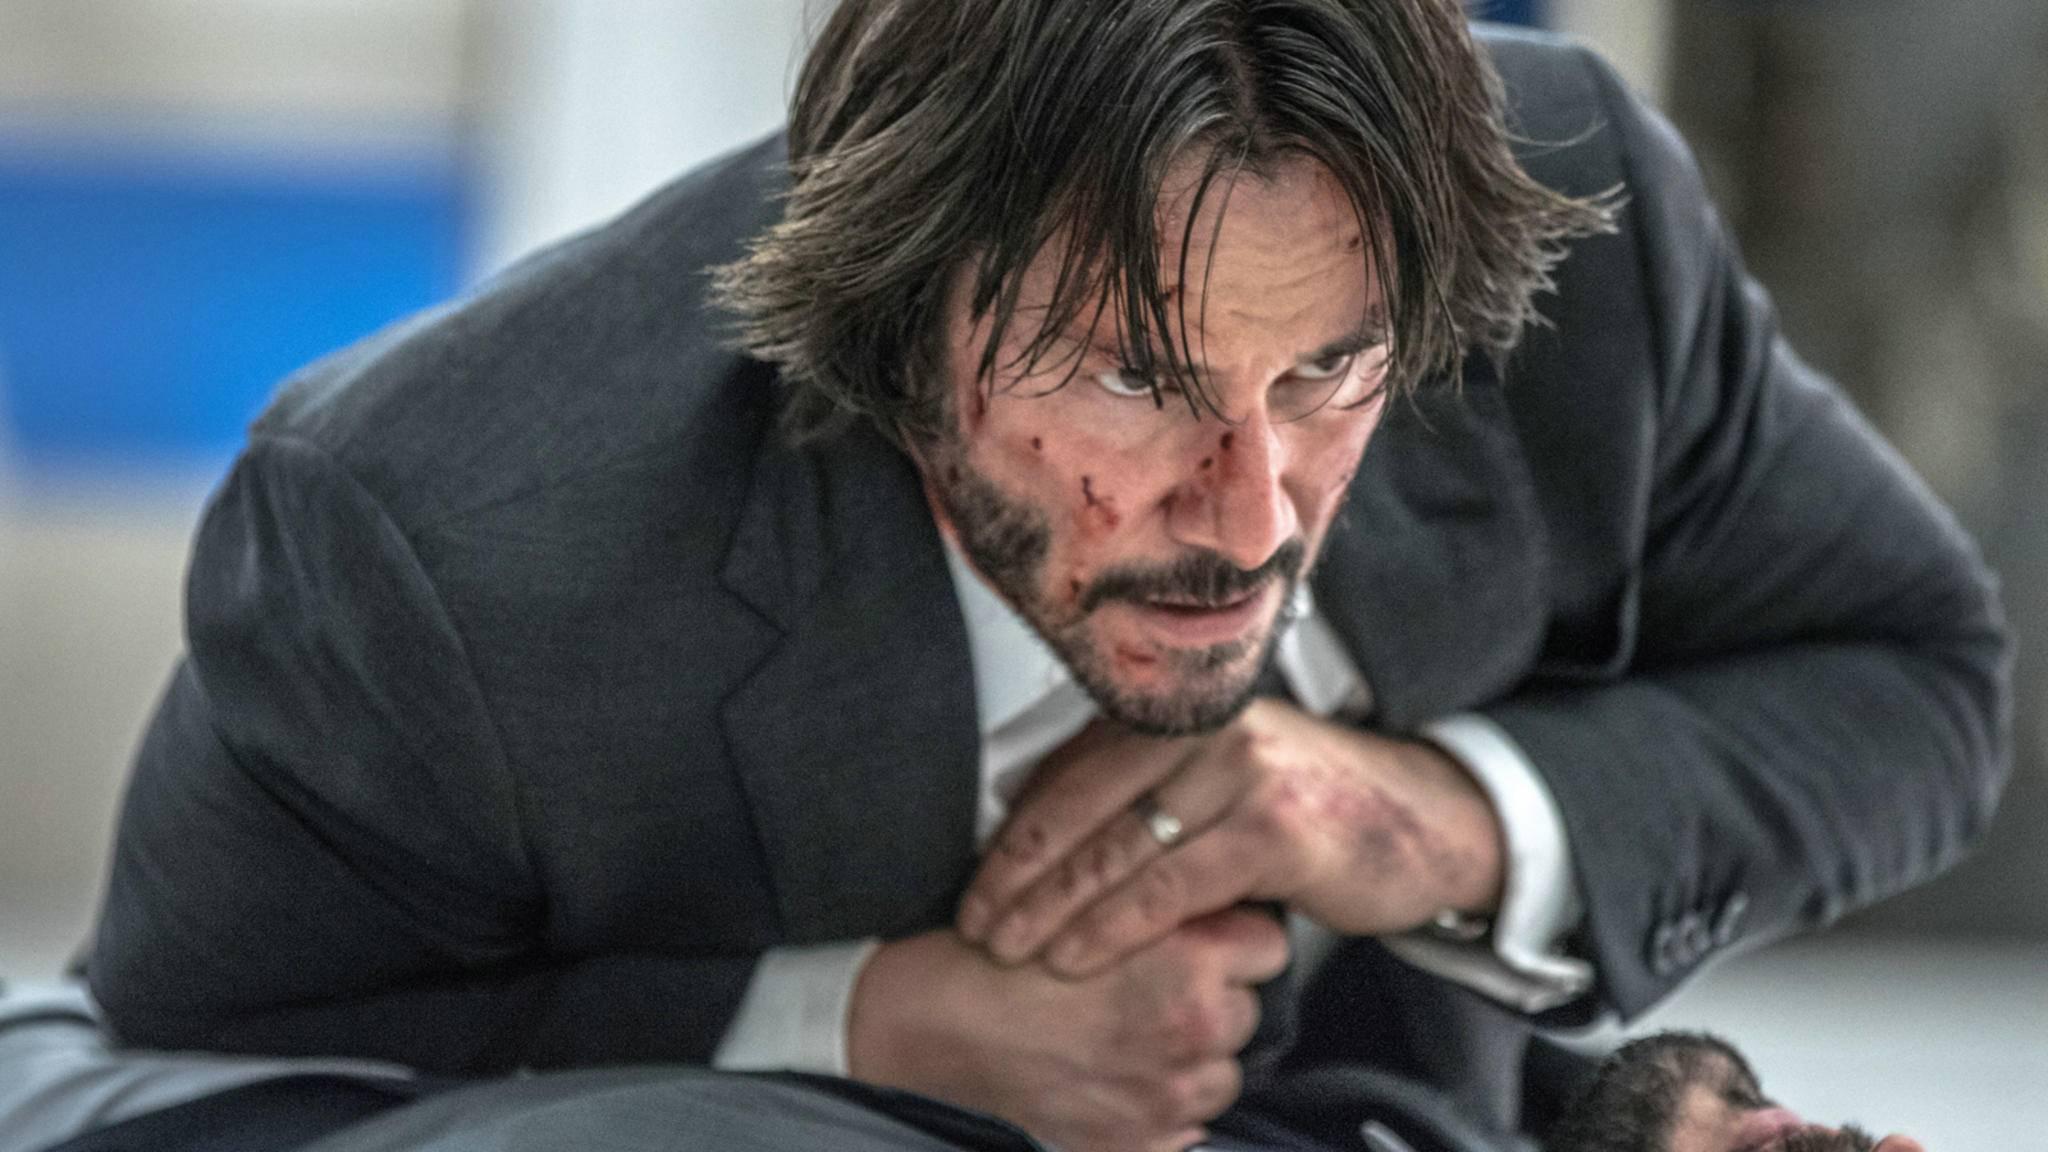 Sehen wir Keanu Reeves bald mit Krallen statt Knarre?